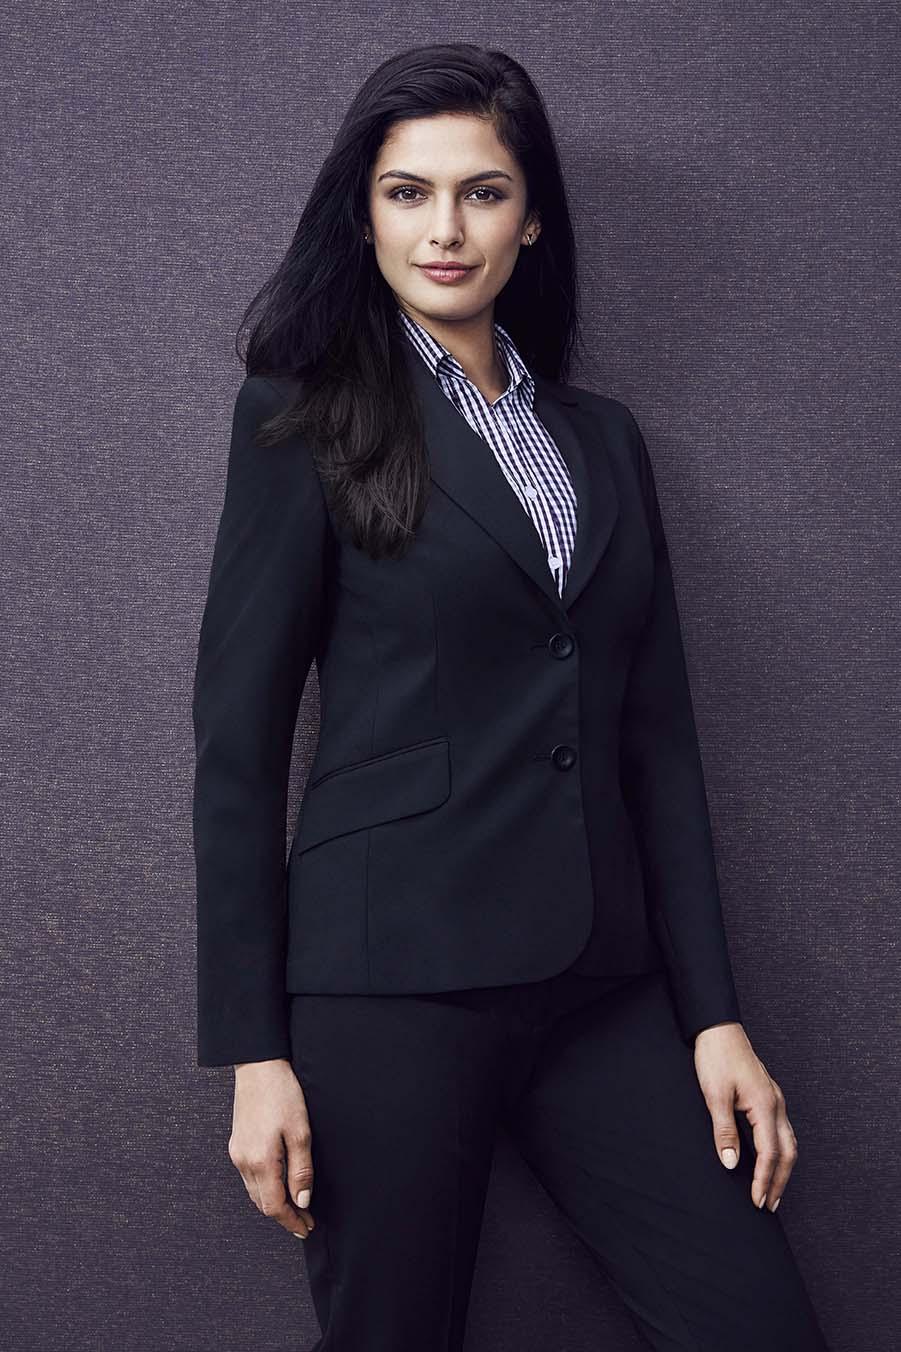 Womens Short-Mid Length Jacket